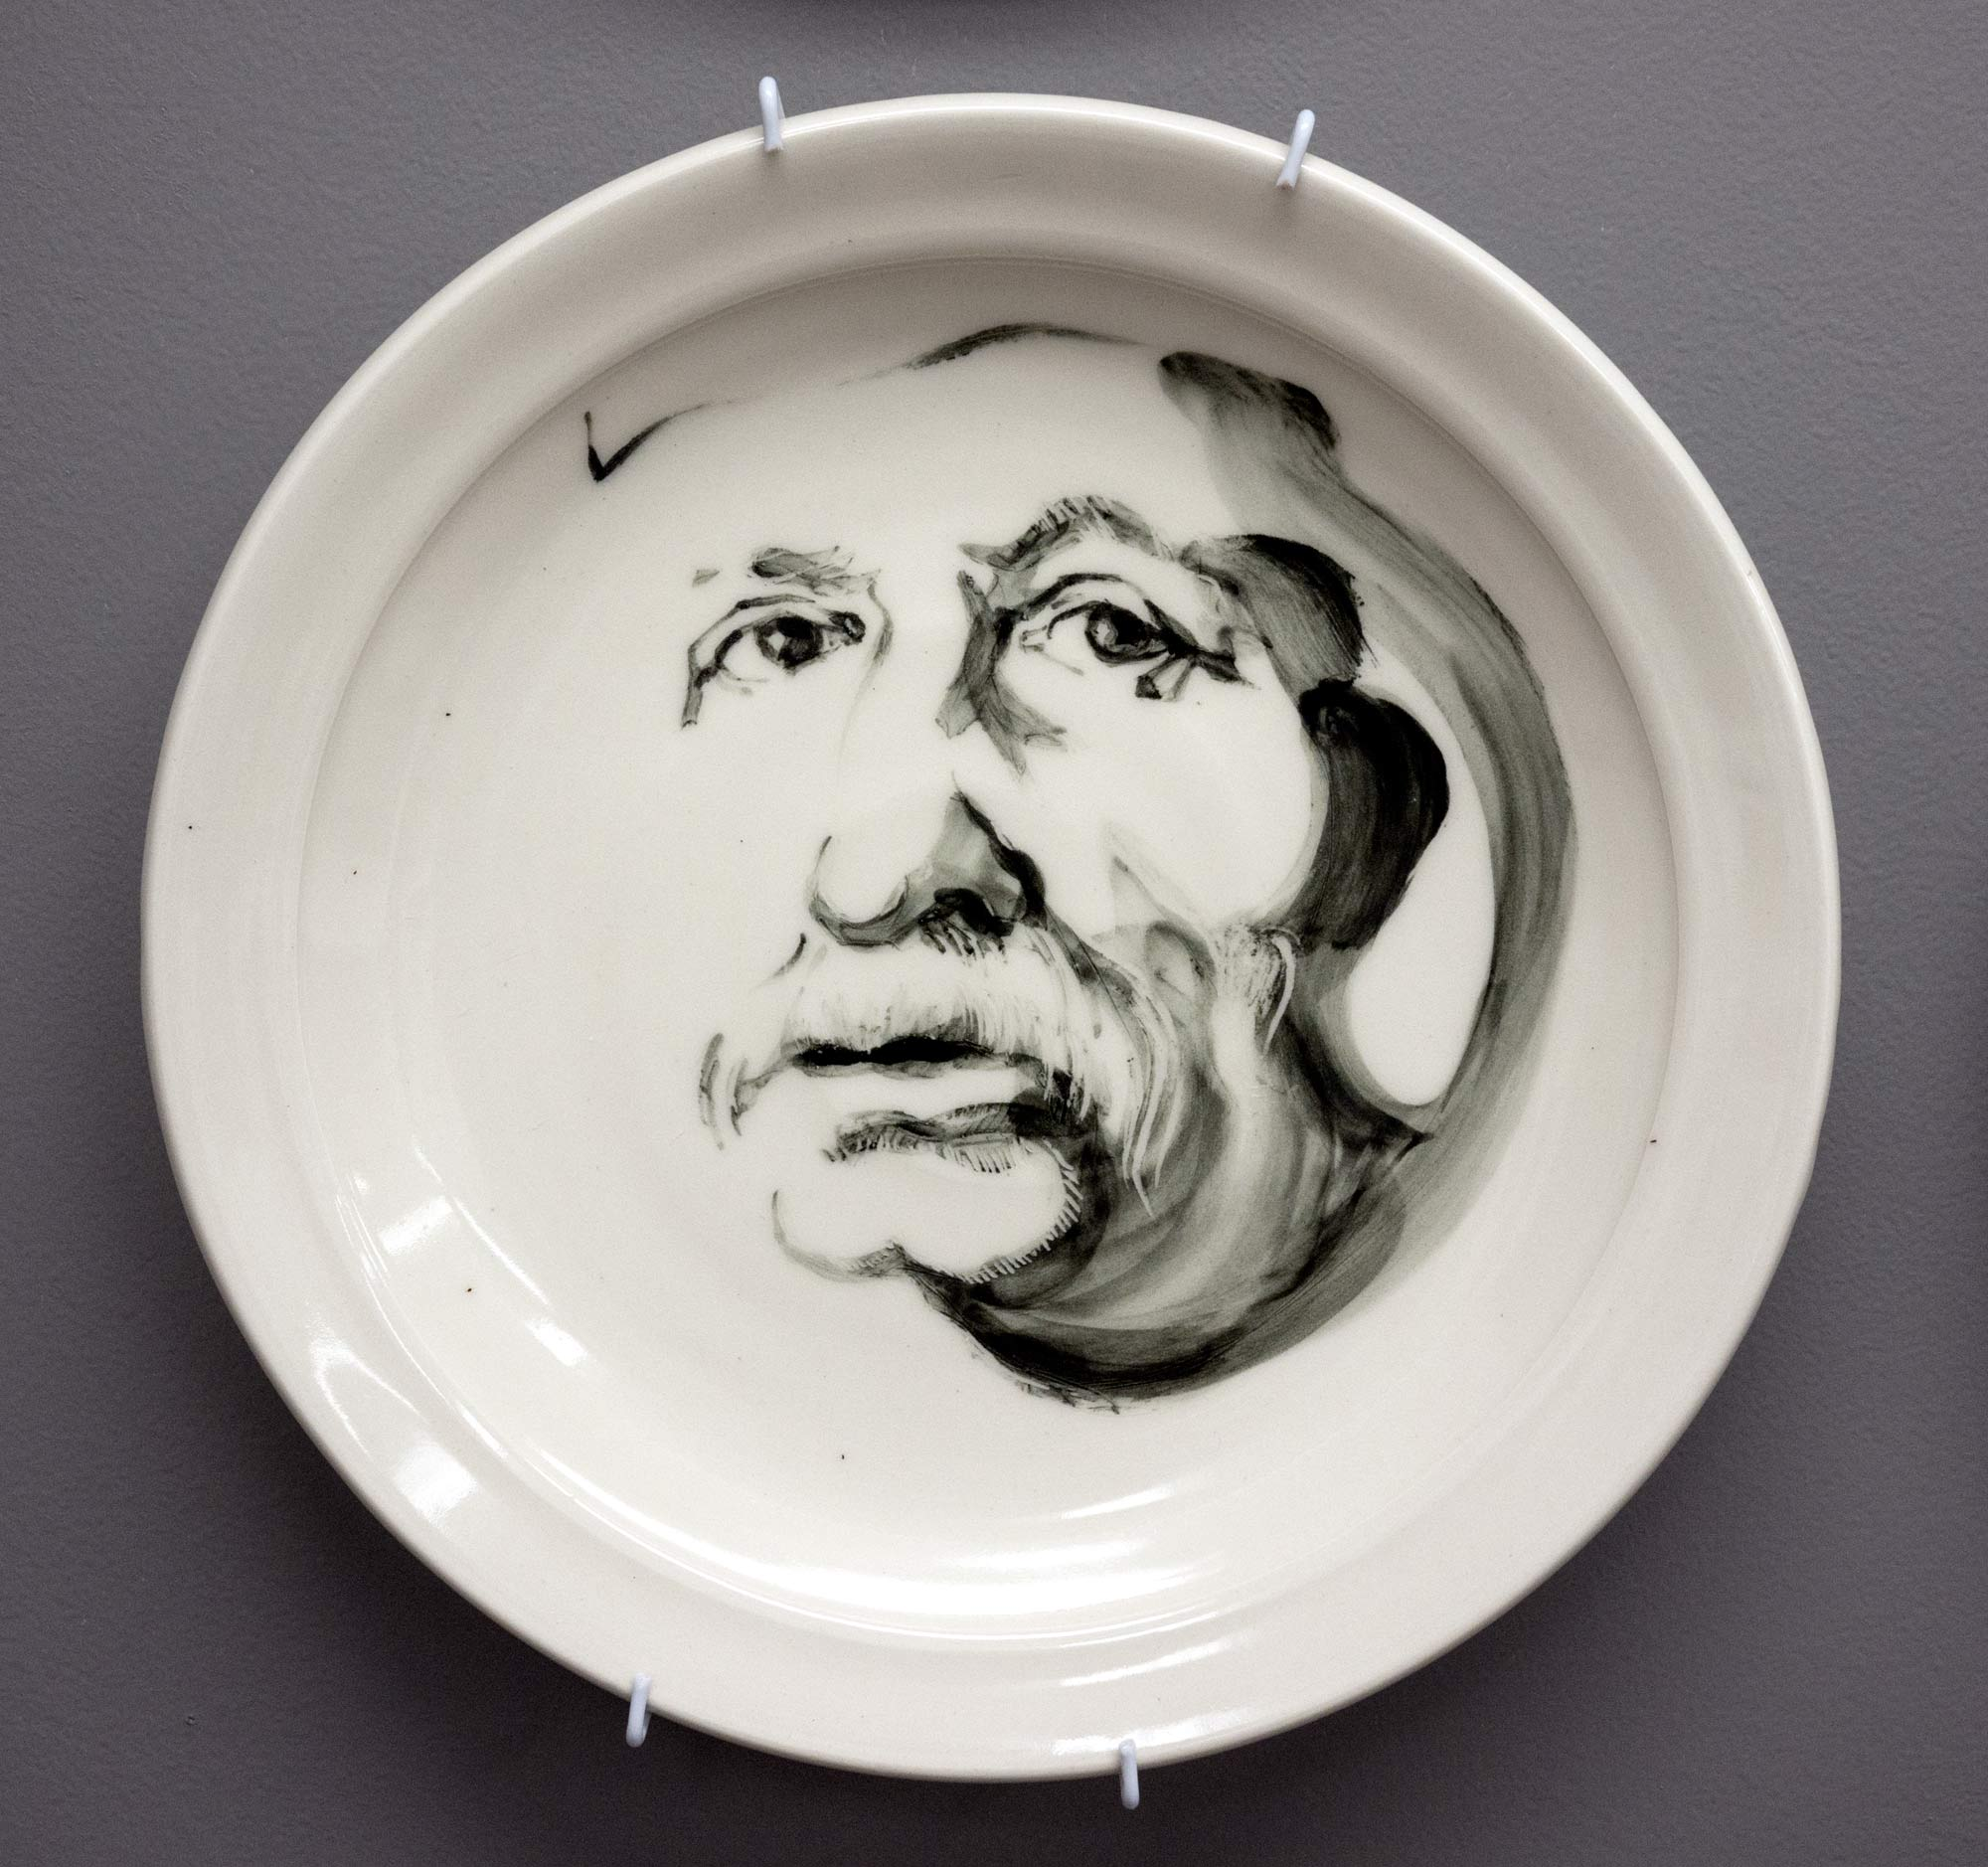 Collaborative Plate: Auguste Escoffier